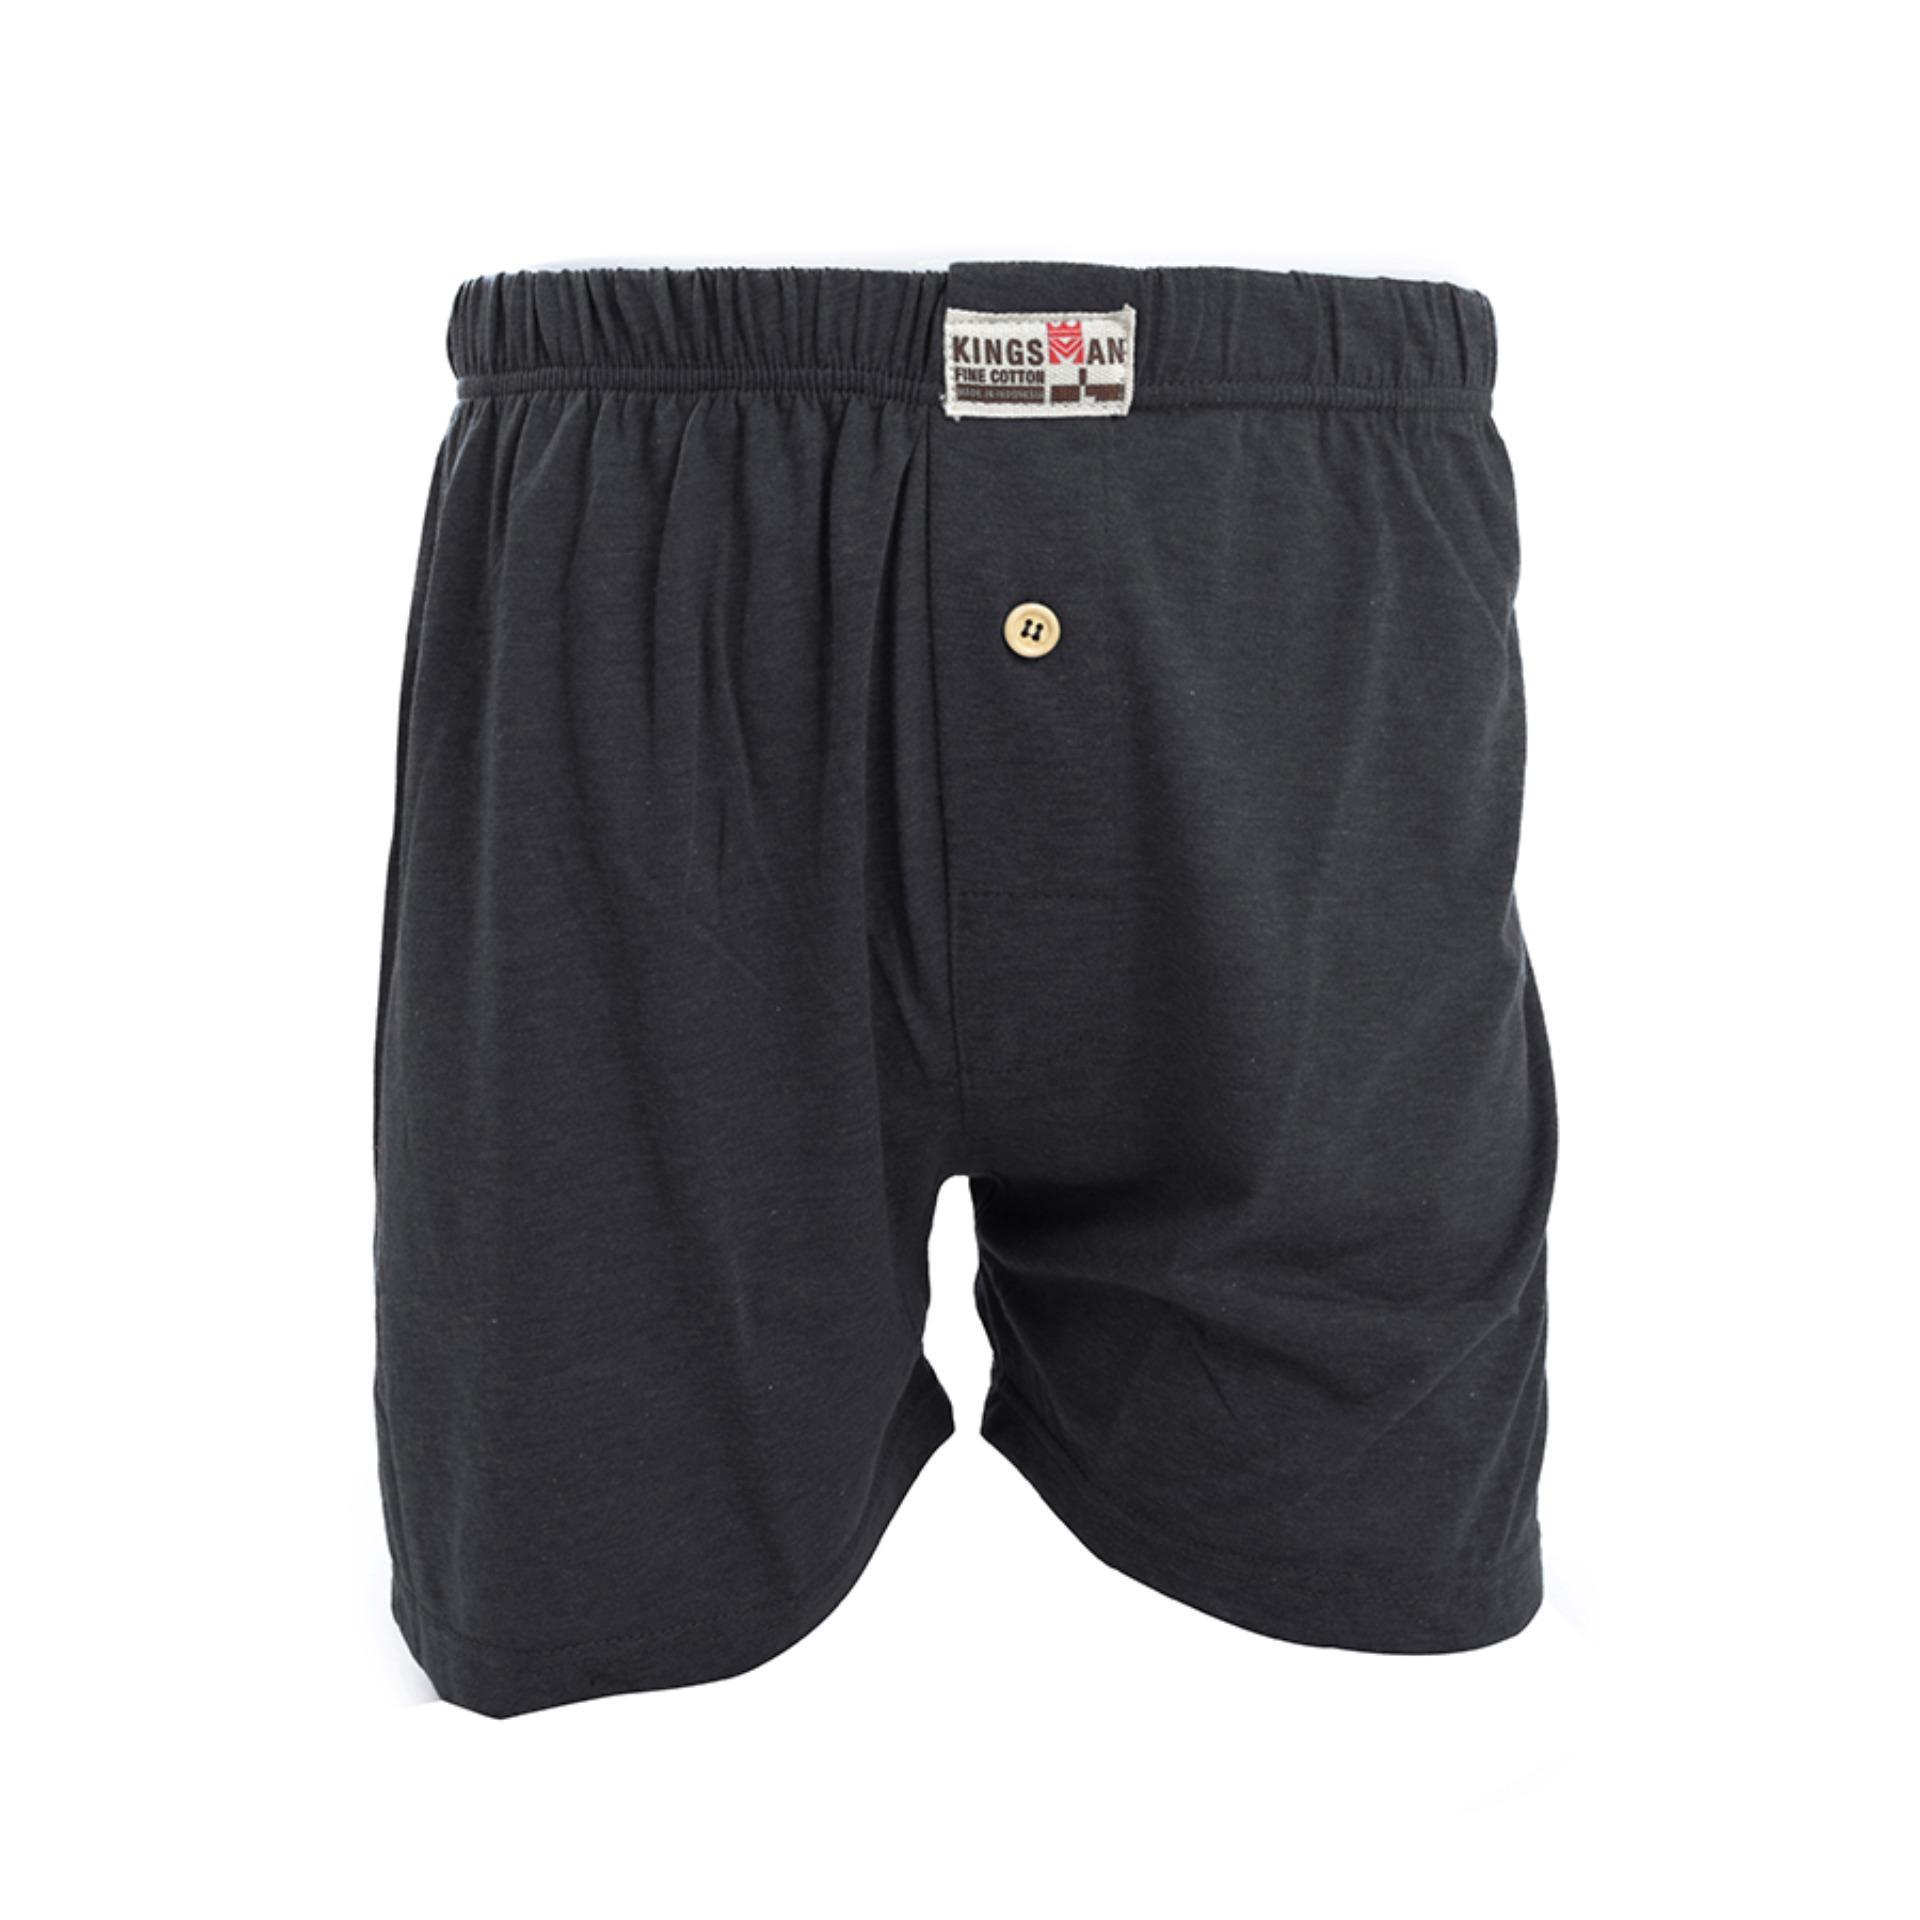 Murah Rider Sport R761b Mini Brief Celana Dalam Pria 3 Buah Elfs Shop Pakaian Boxer Katun 45d13 Abu